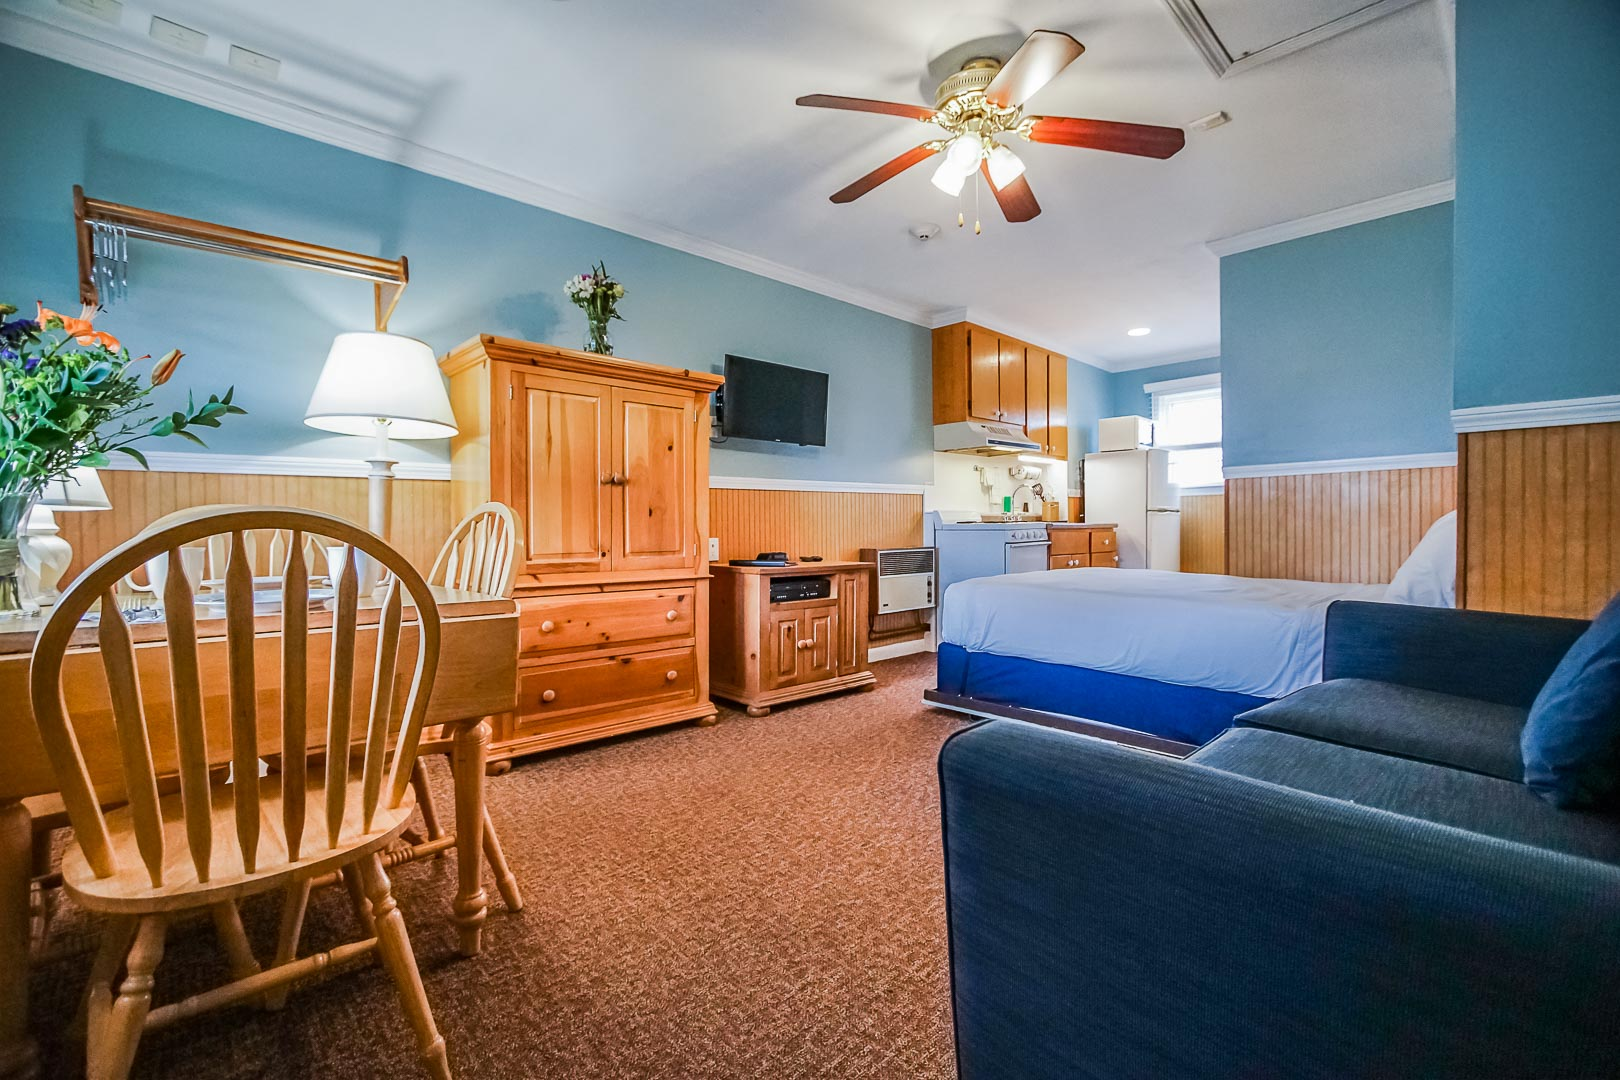 A tranquil studio unit at VRI's Island Manor Resort in Rhode Island.